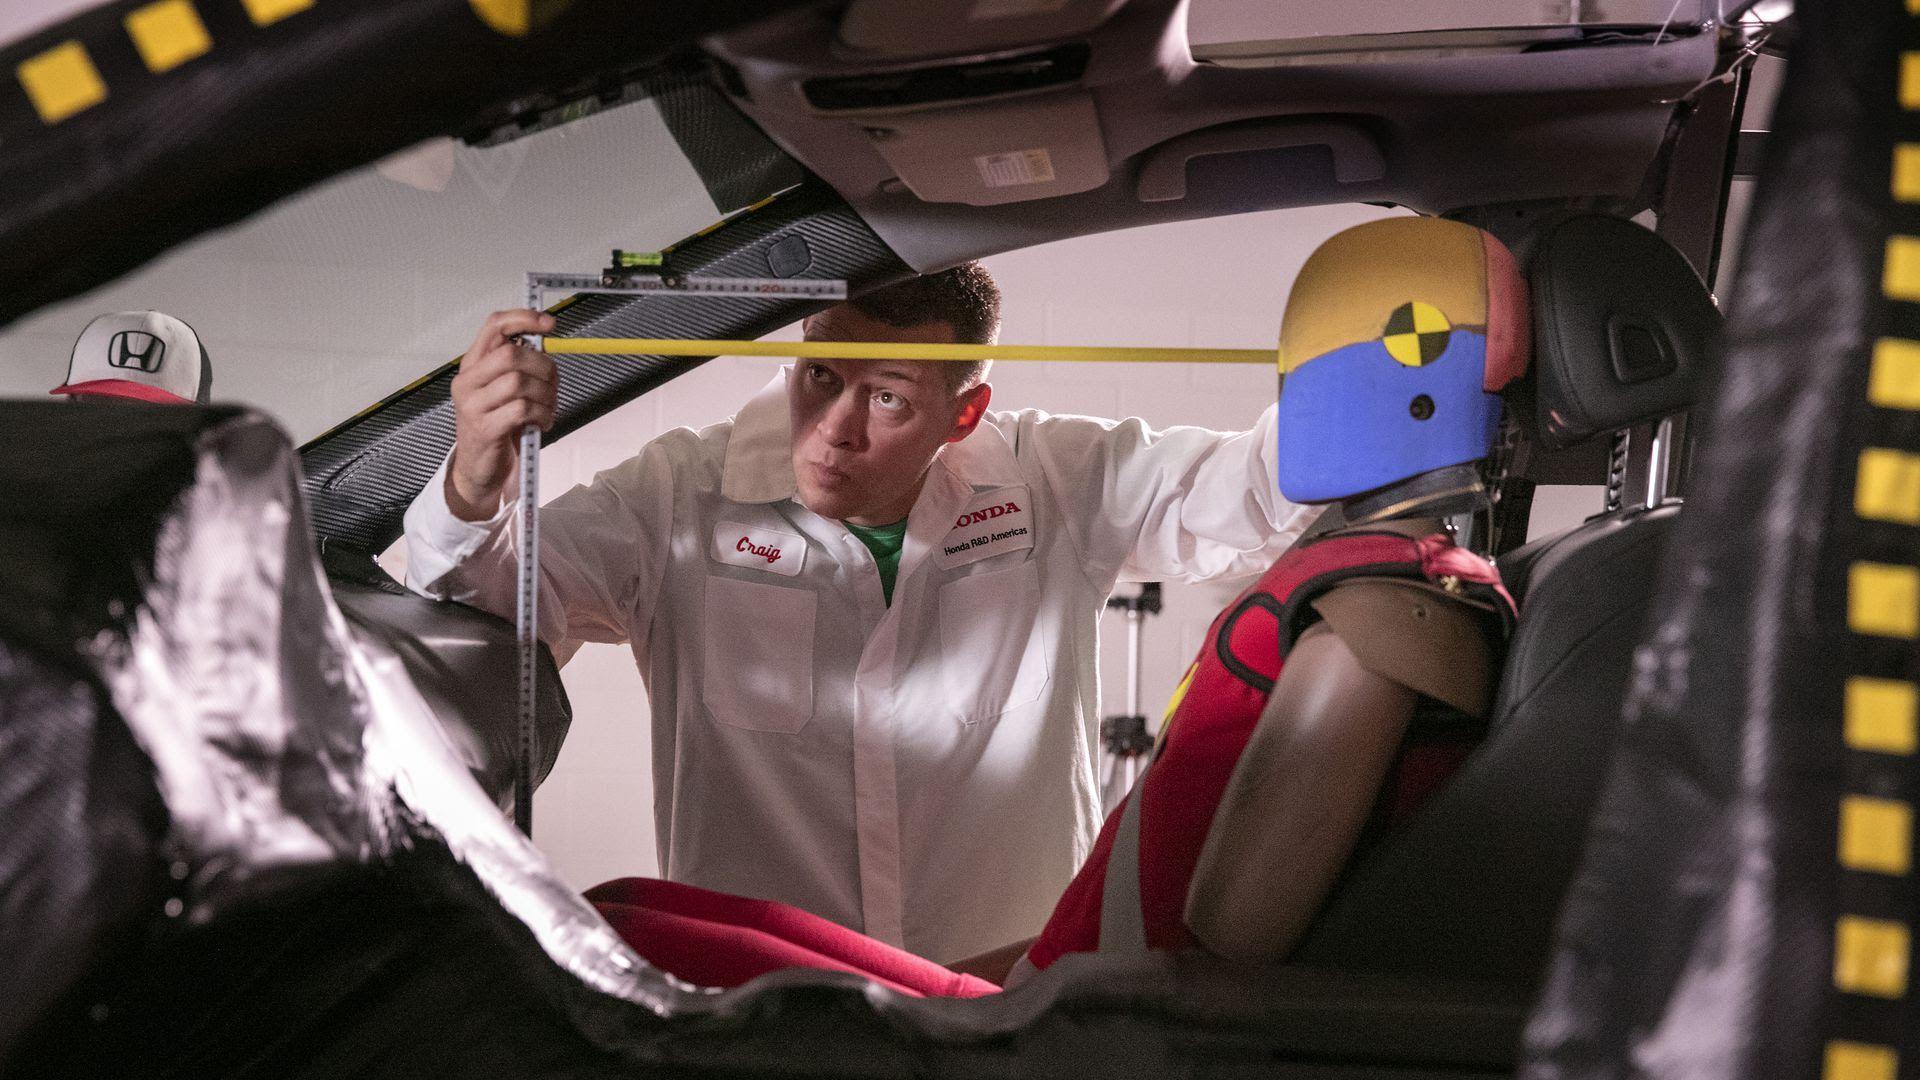 Honda engineer takes measurements ahead of a simulated crash test